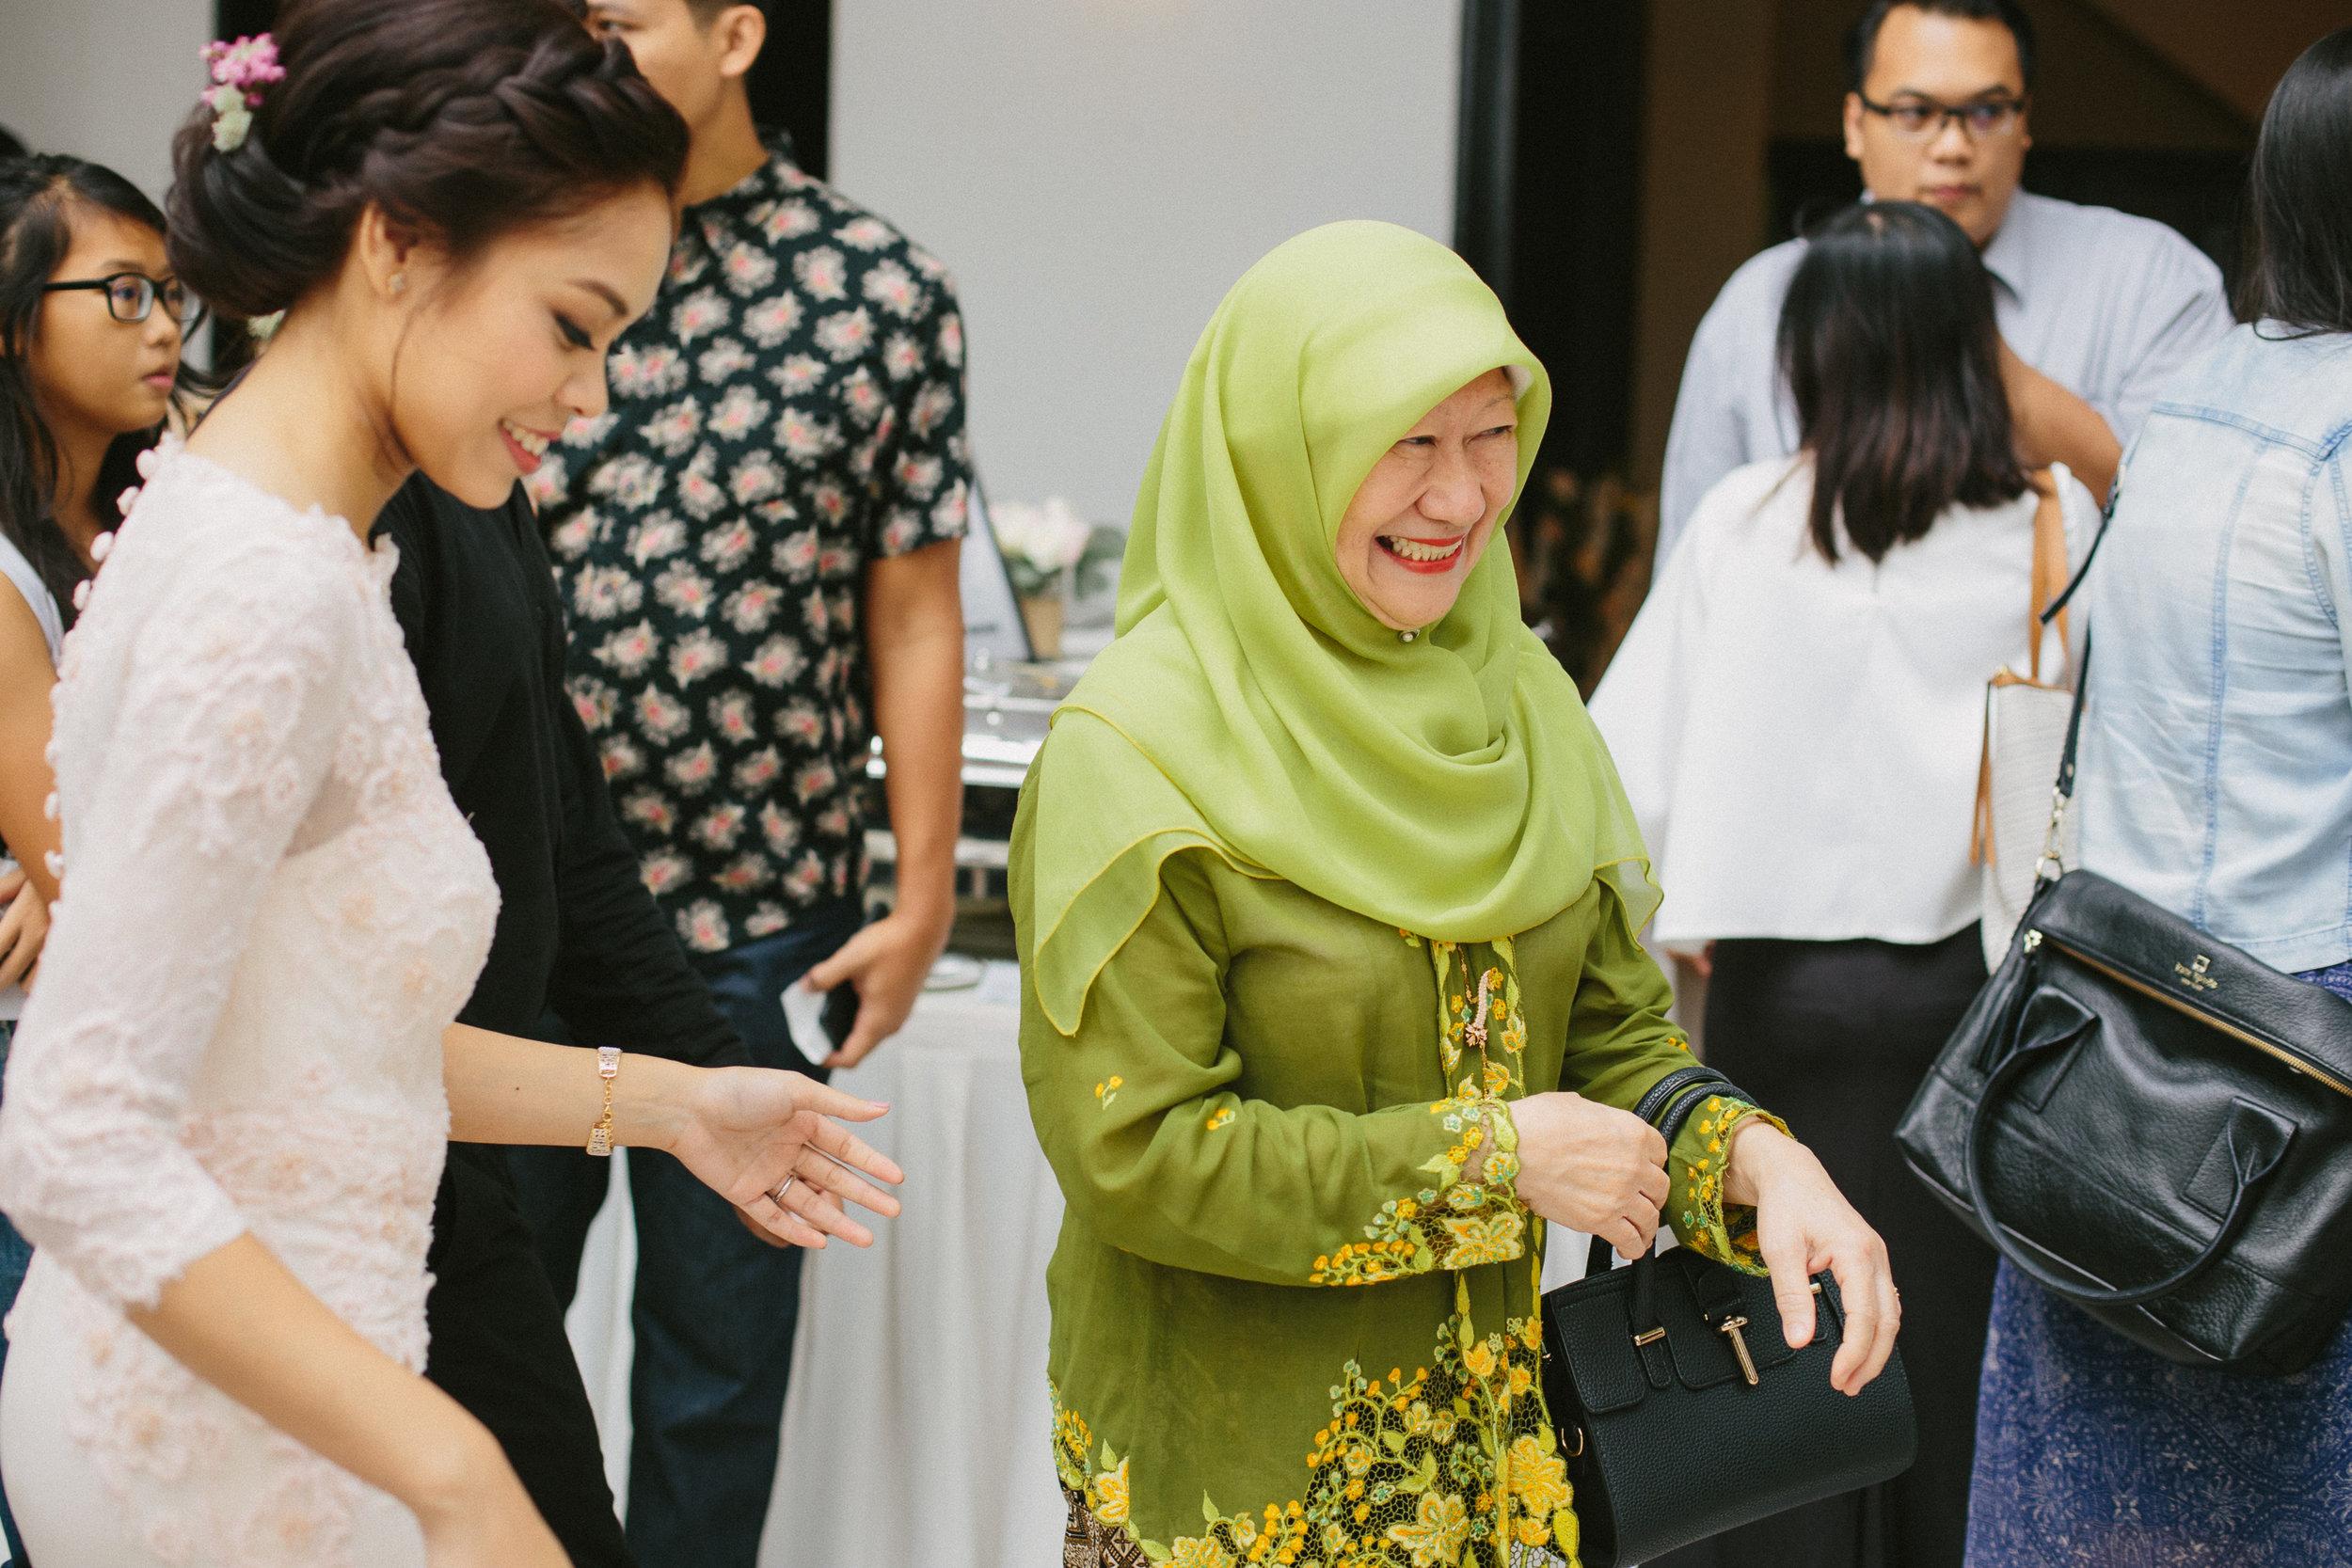 singapore-wedding-photographer-fadilah-kwan-018.jpg